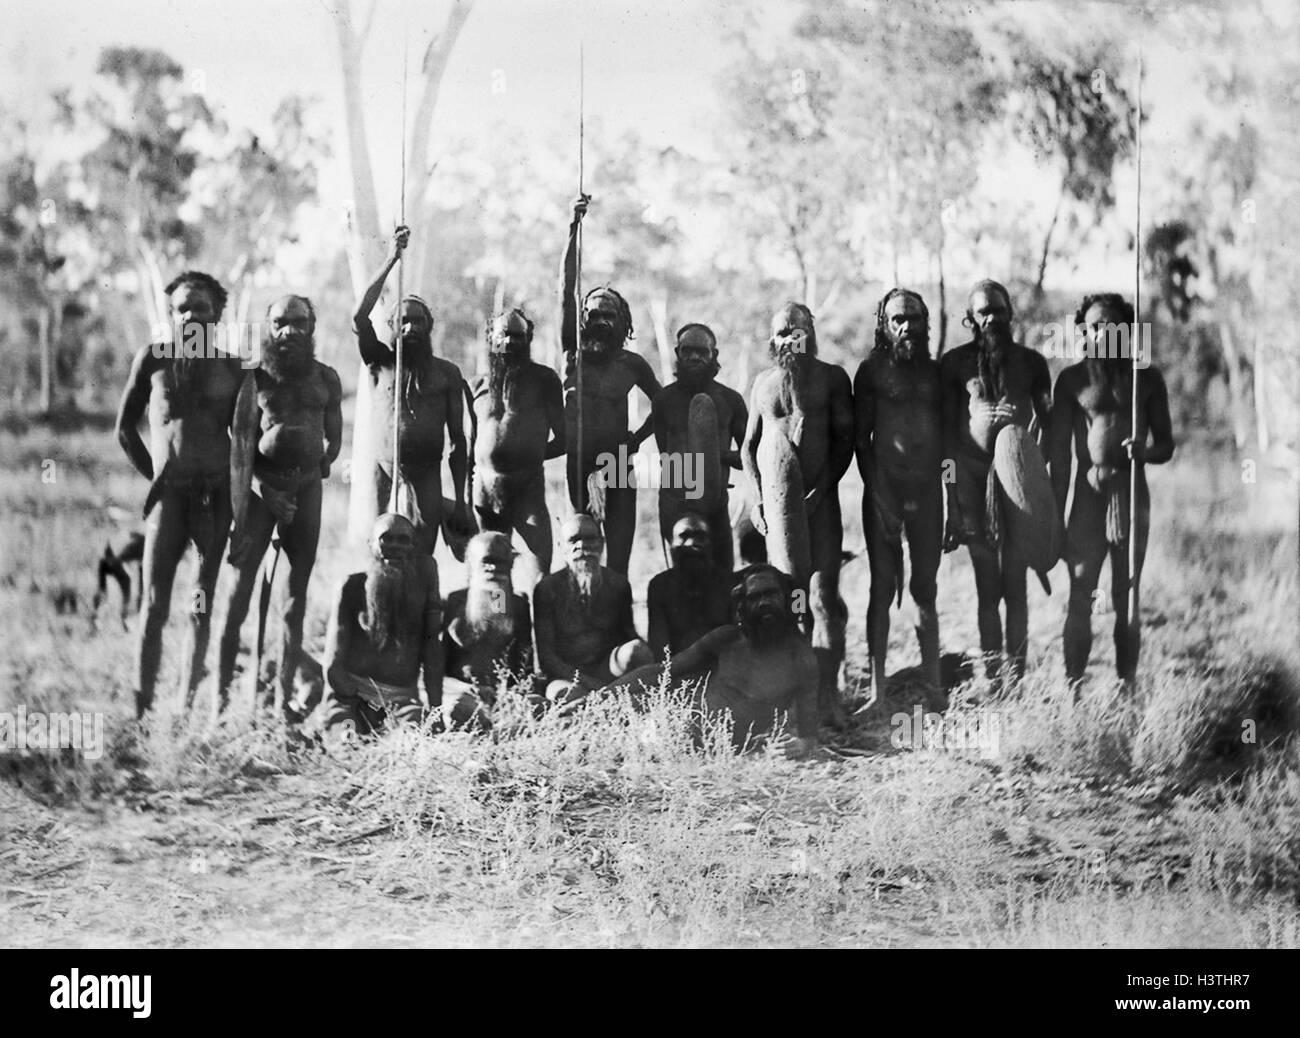 Aboriginal Black and White Stock Photos & Images - Alamy